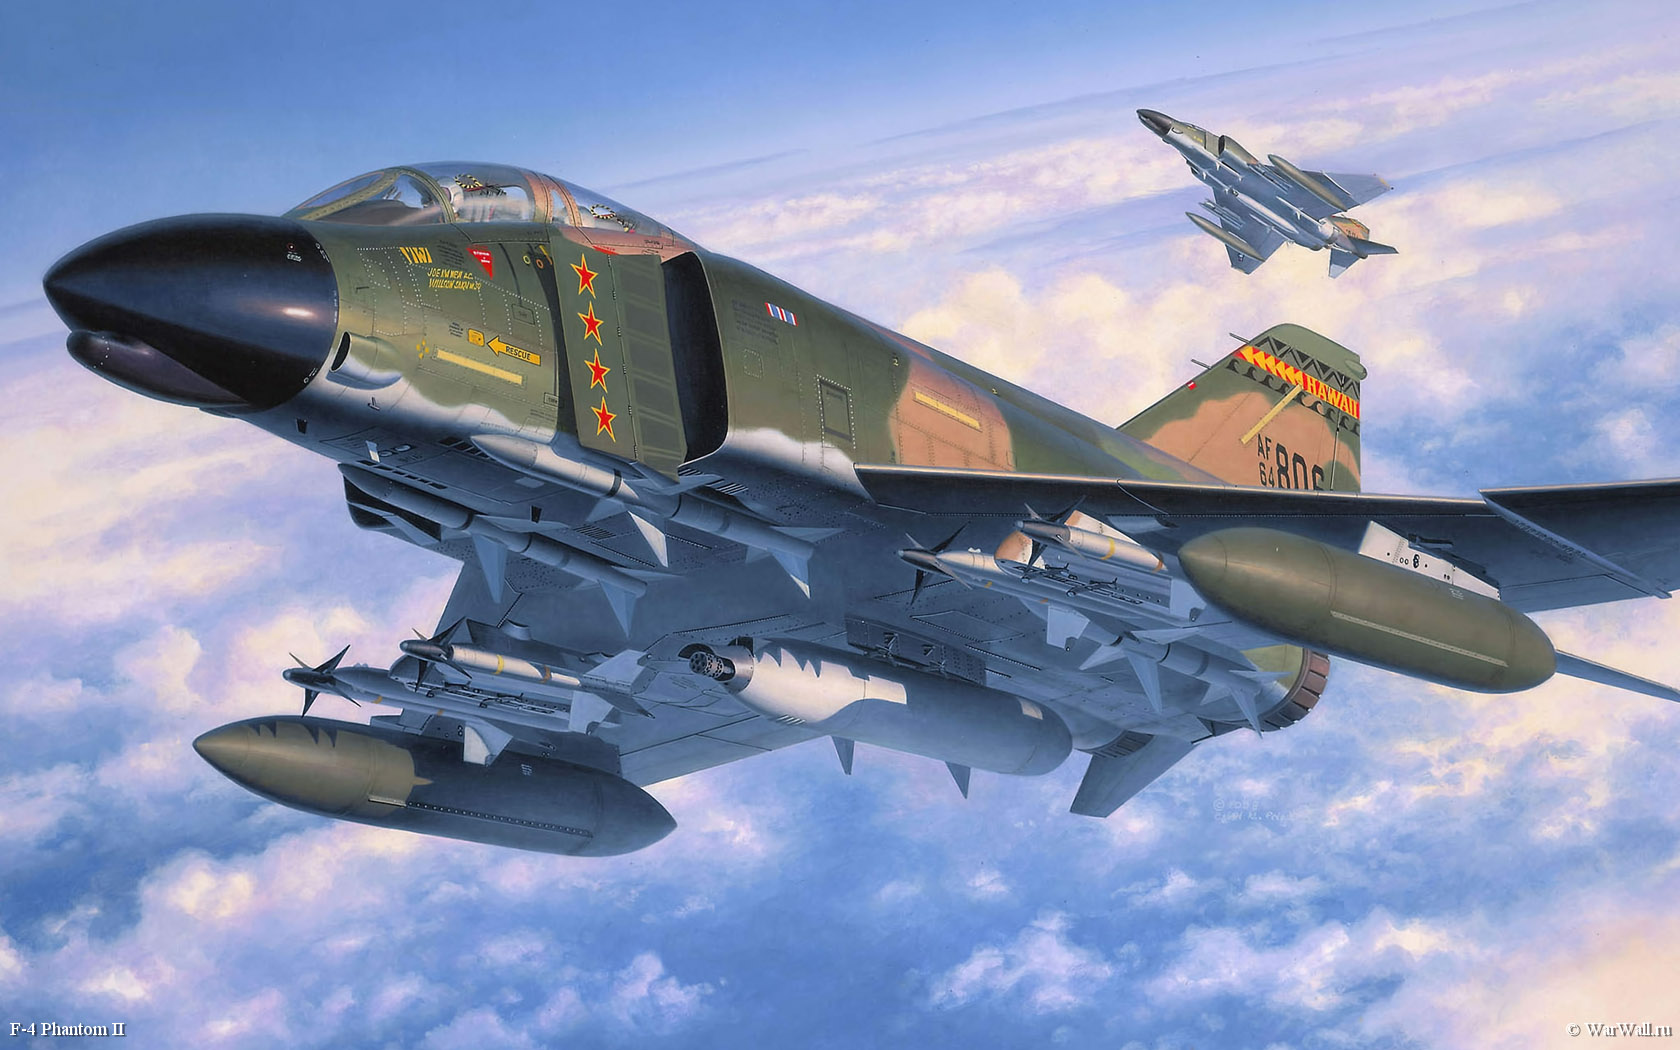 рисунок 04583 F4 Phantom II